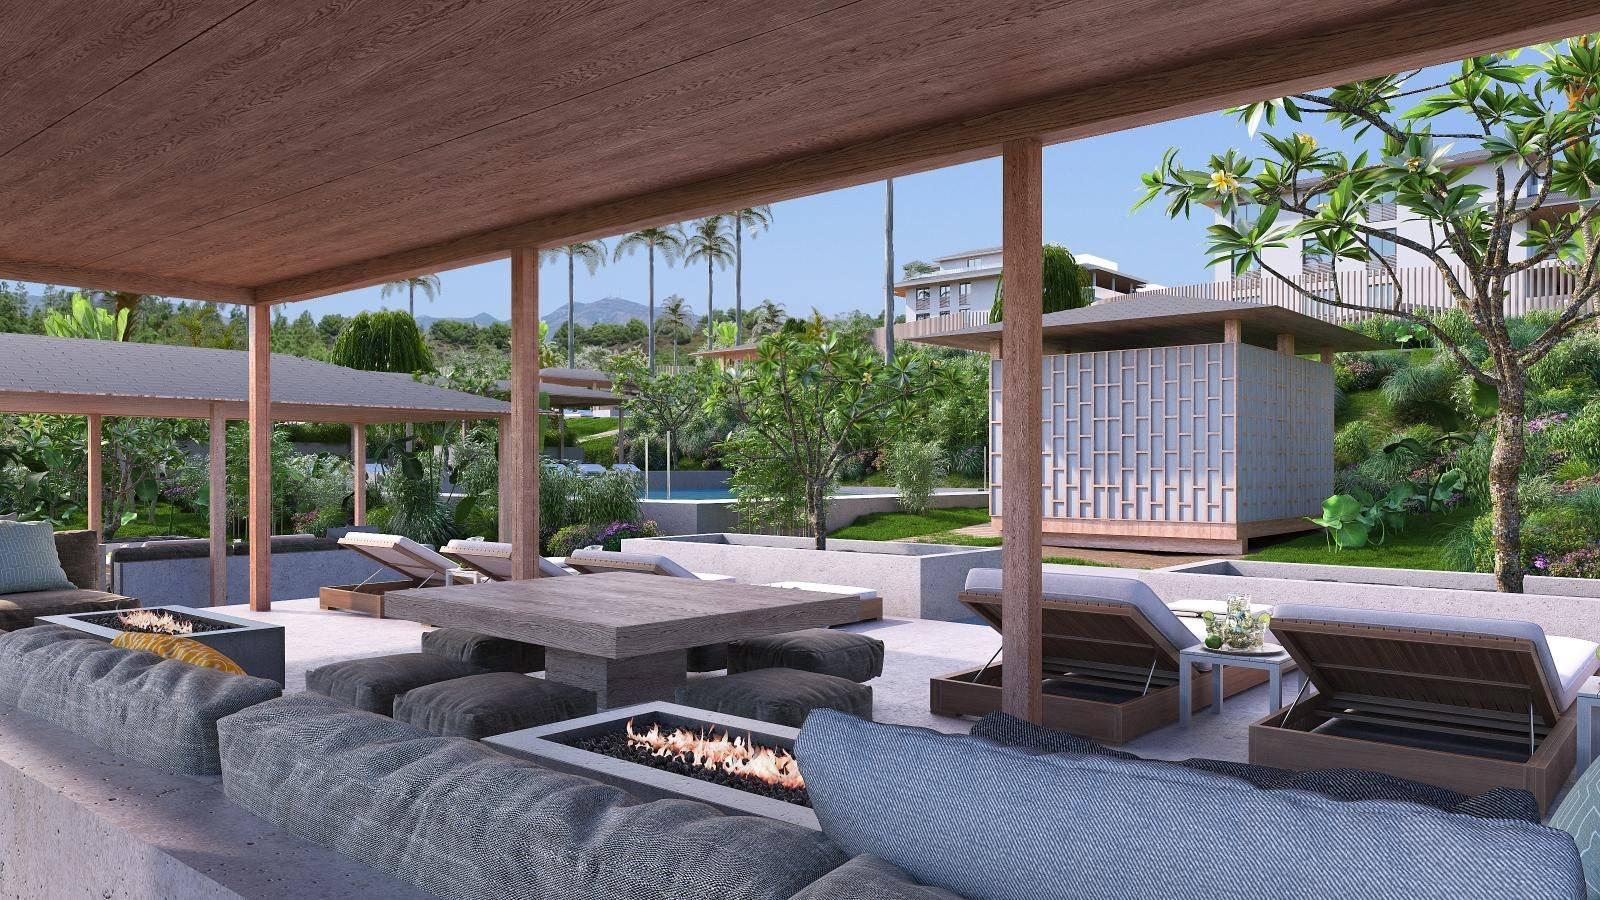 Apartment for sale in Mijas Costa